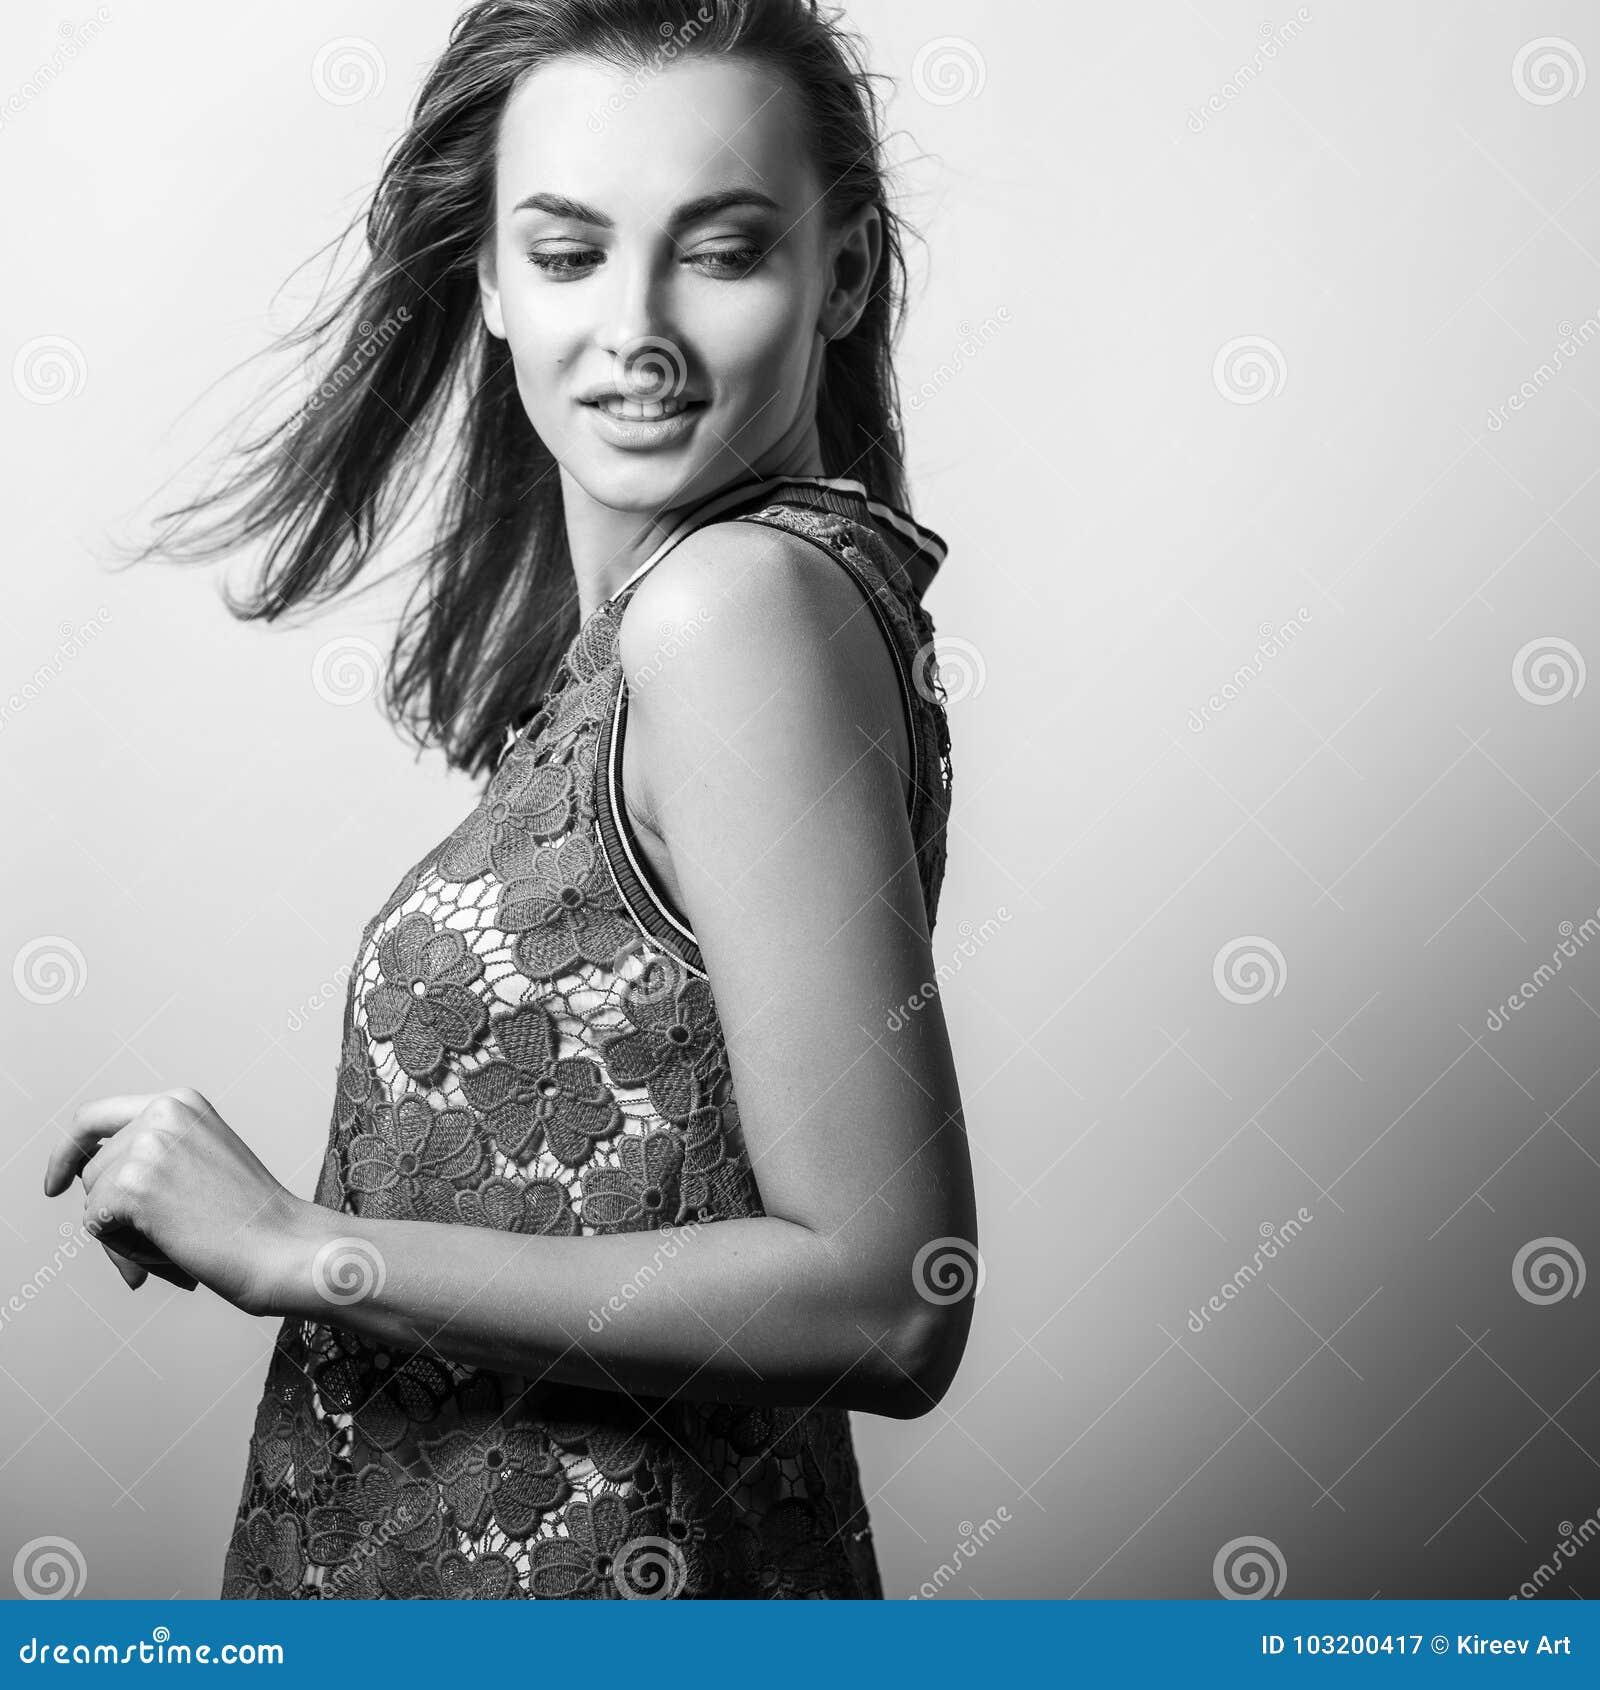 Young sensual model woman pose in studio black white photo